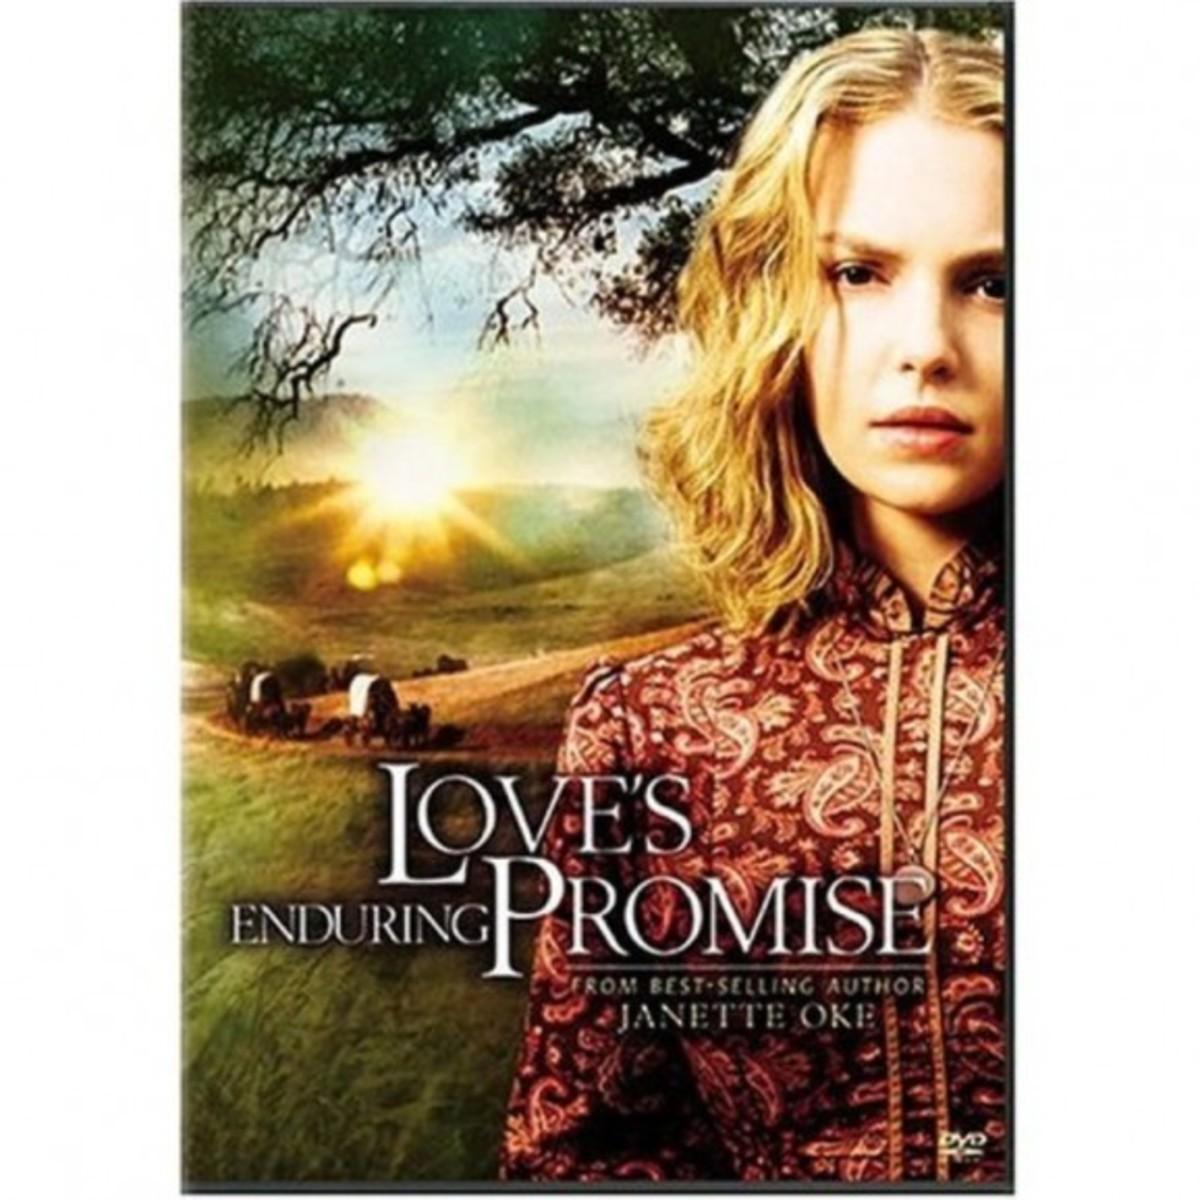 Marty Davis in Love's Enduring Promise